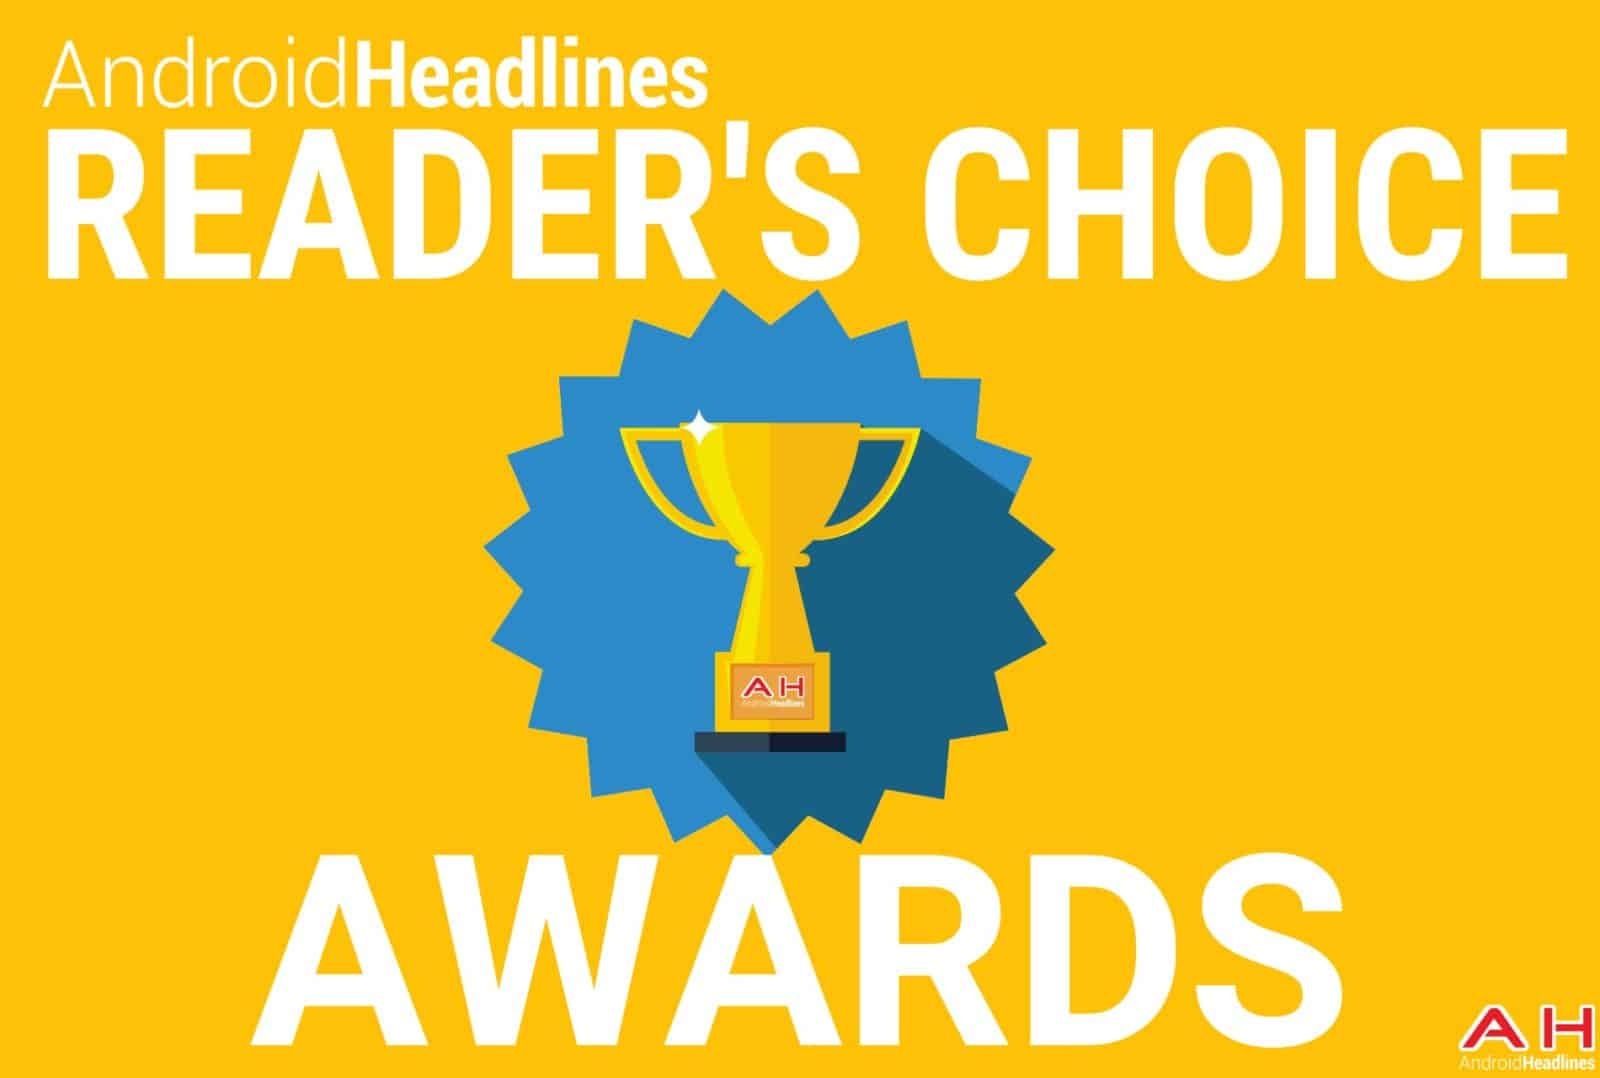 AH READER'S CHOICE AWARDS